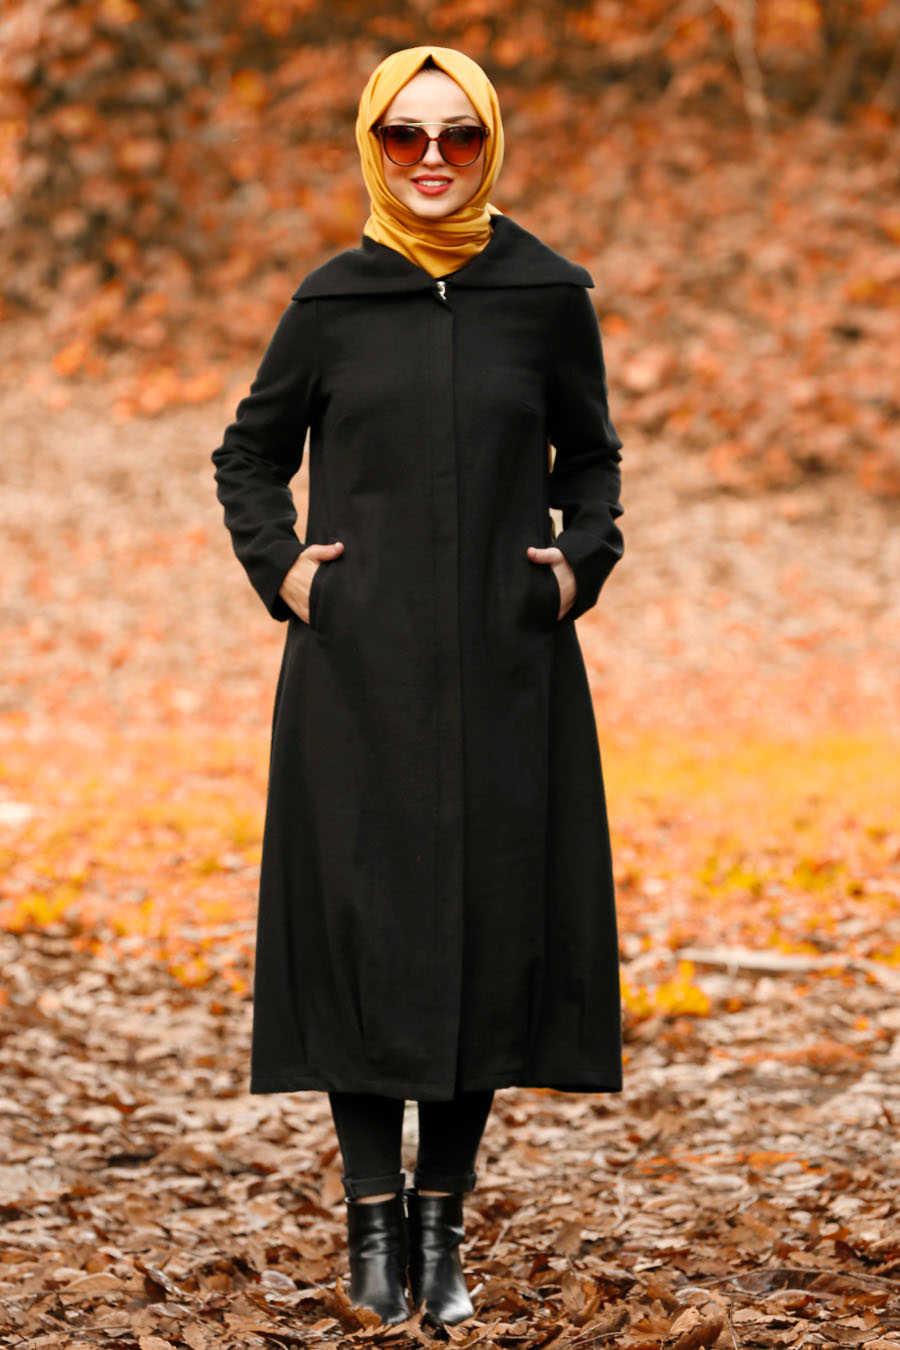 Neva Style - Black Hijab Coat 2453S